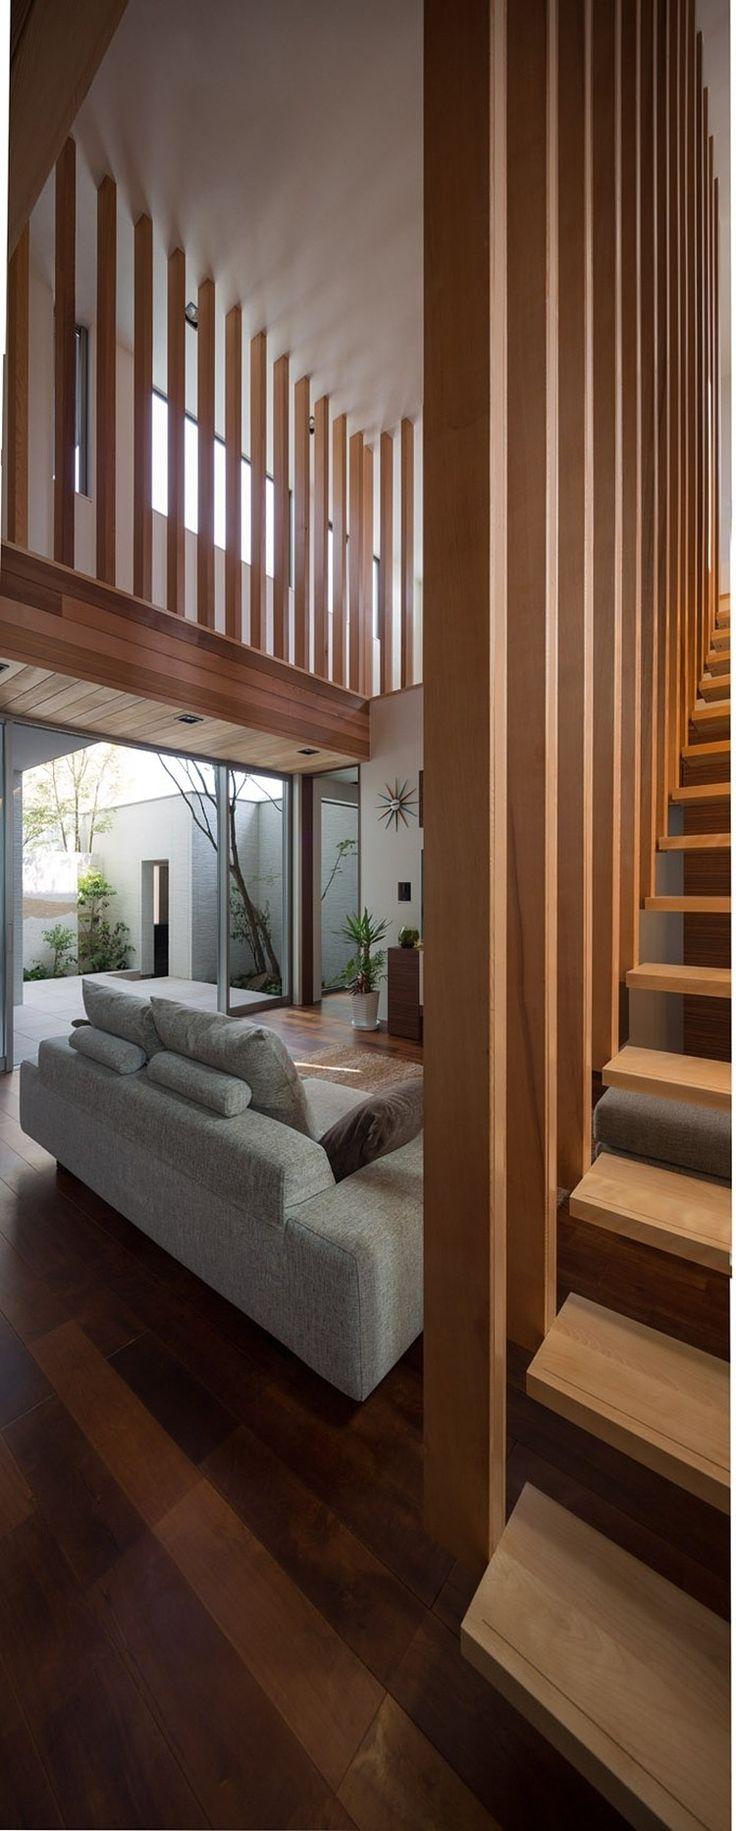 CJWHO ™ (M4-house, Hasami, Nagasaki, Japan by Architect...)